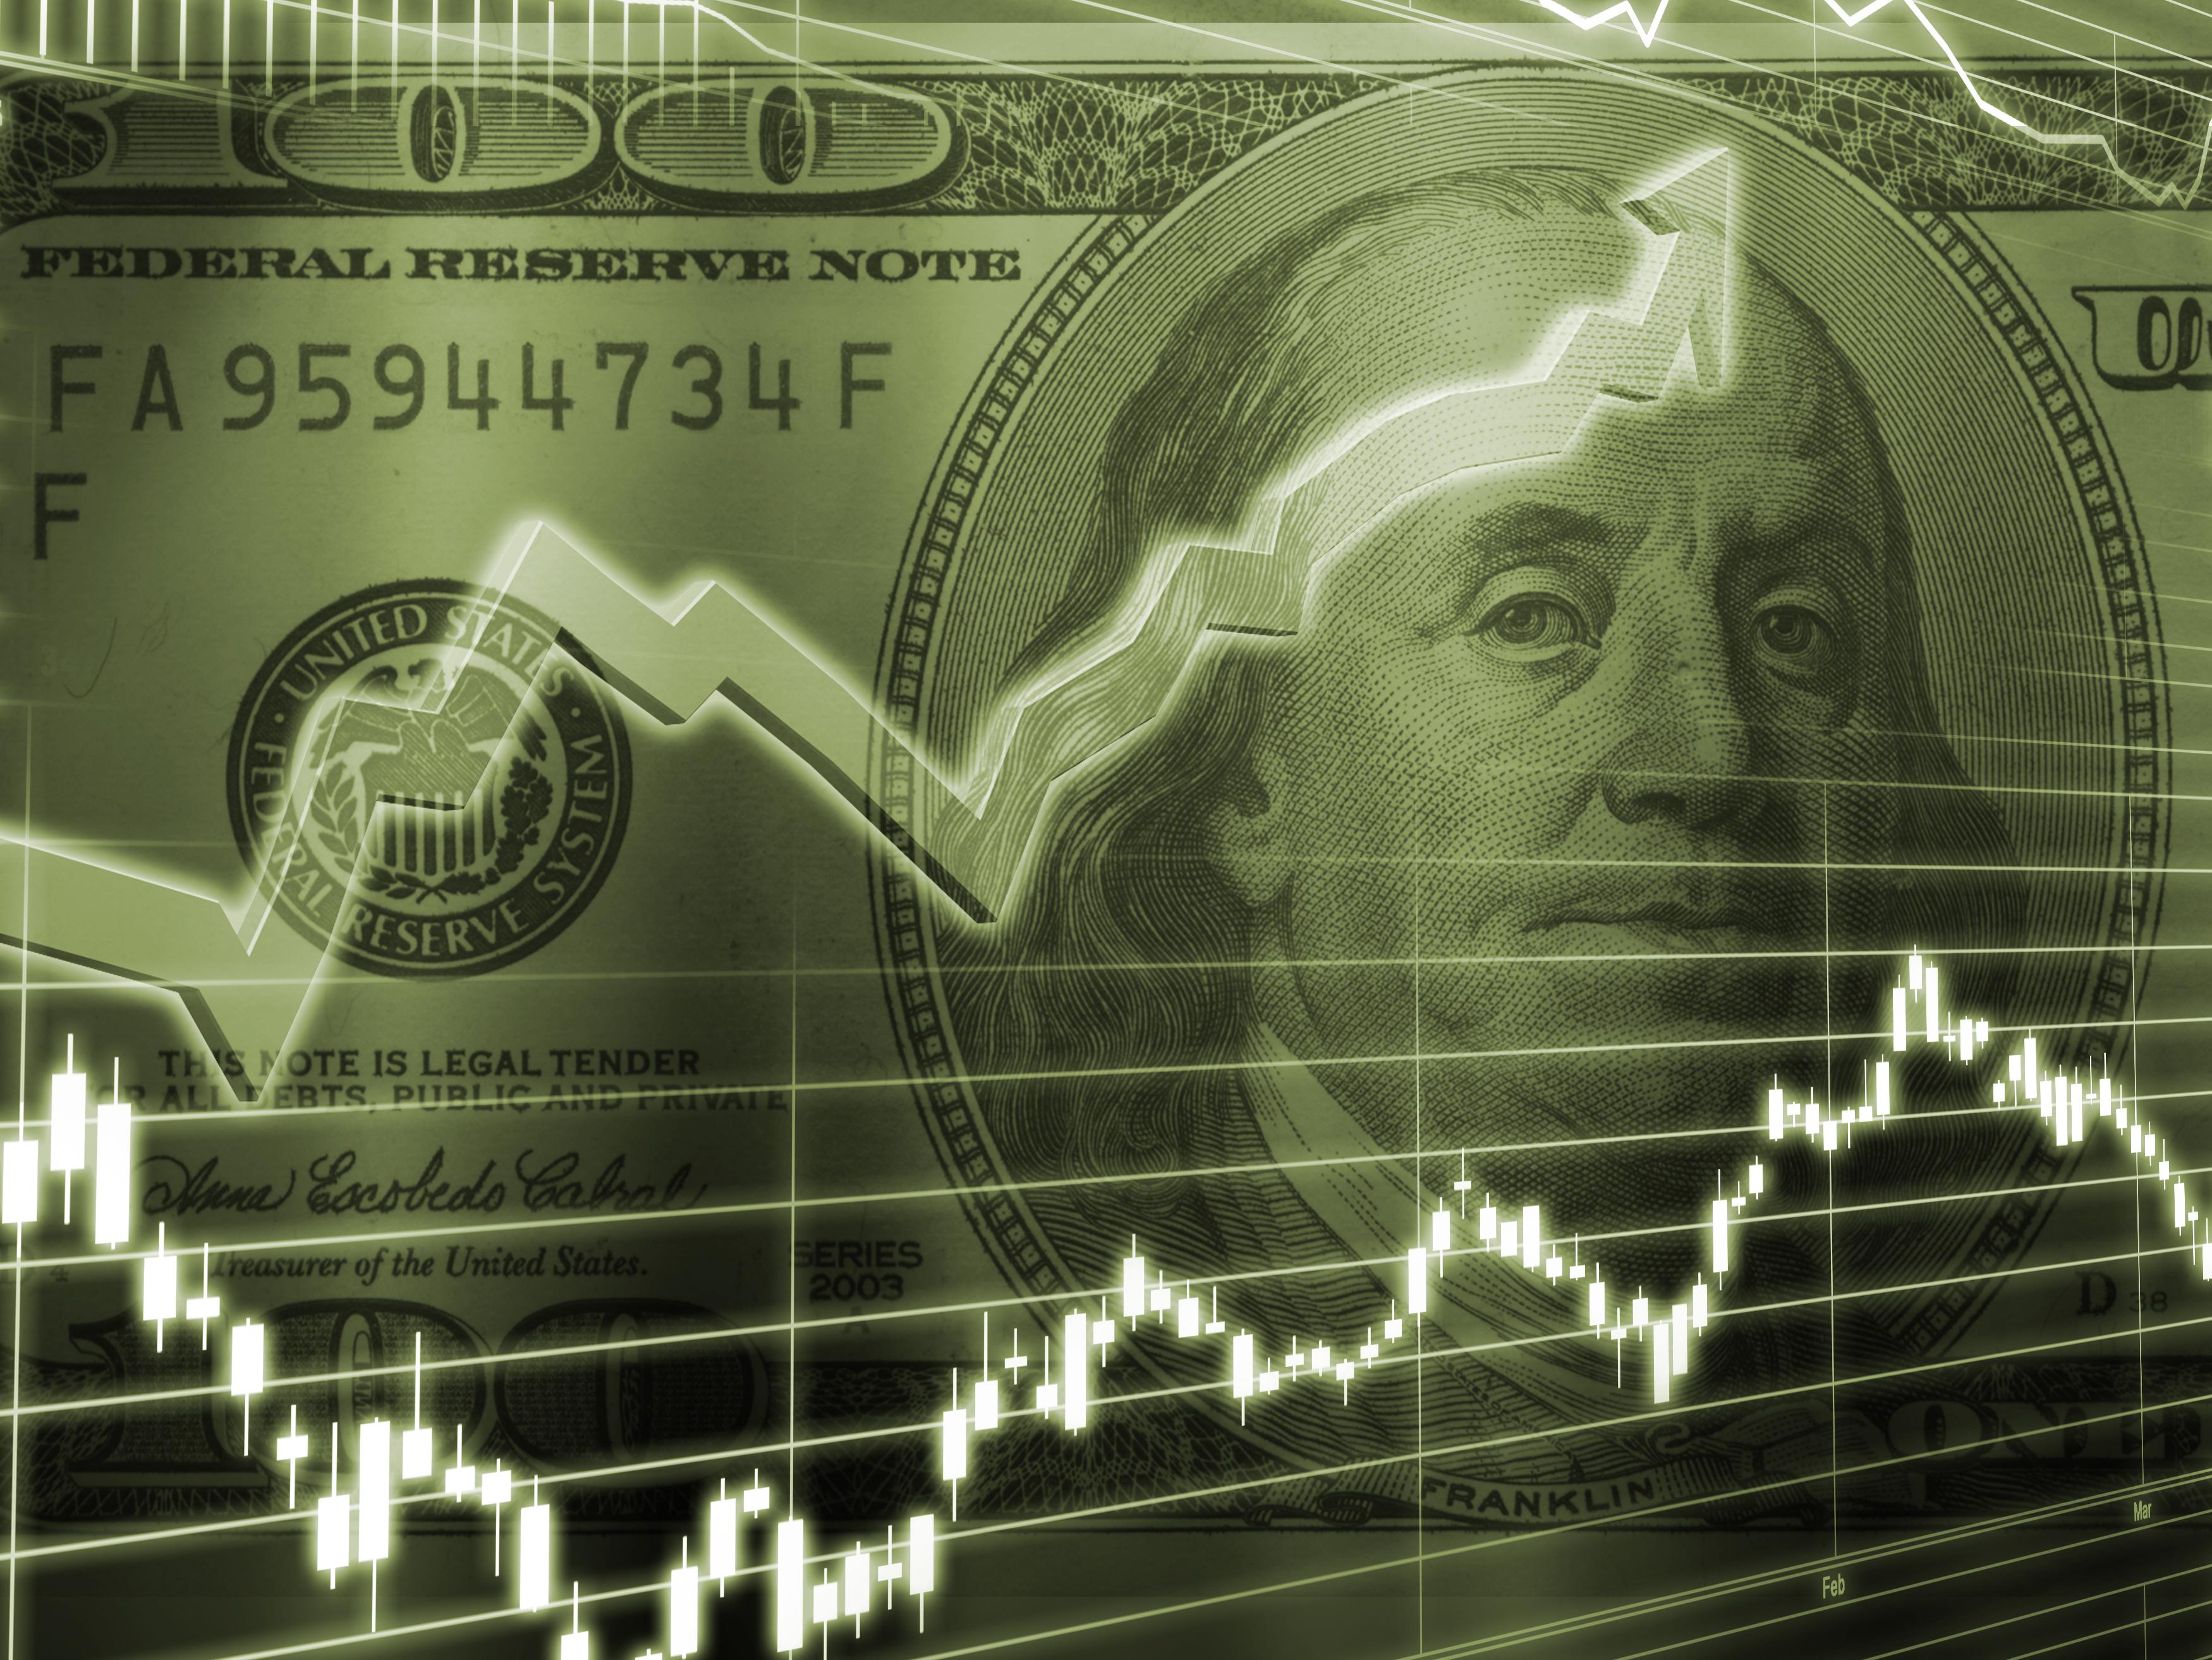 Ben Franklin 100 Dollar Bill with Stock Market overlay.